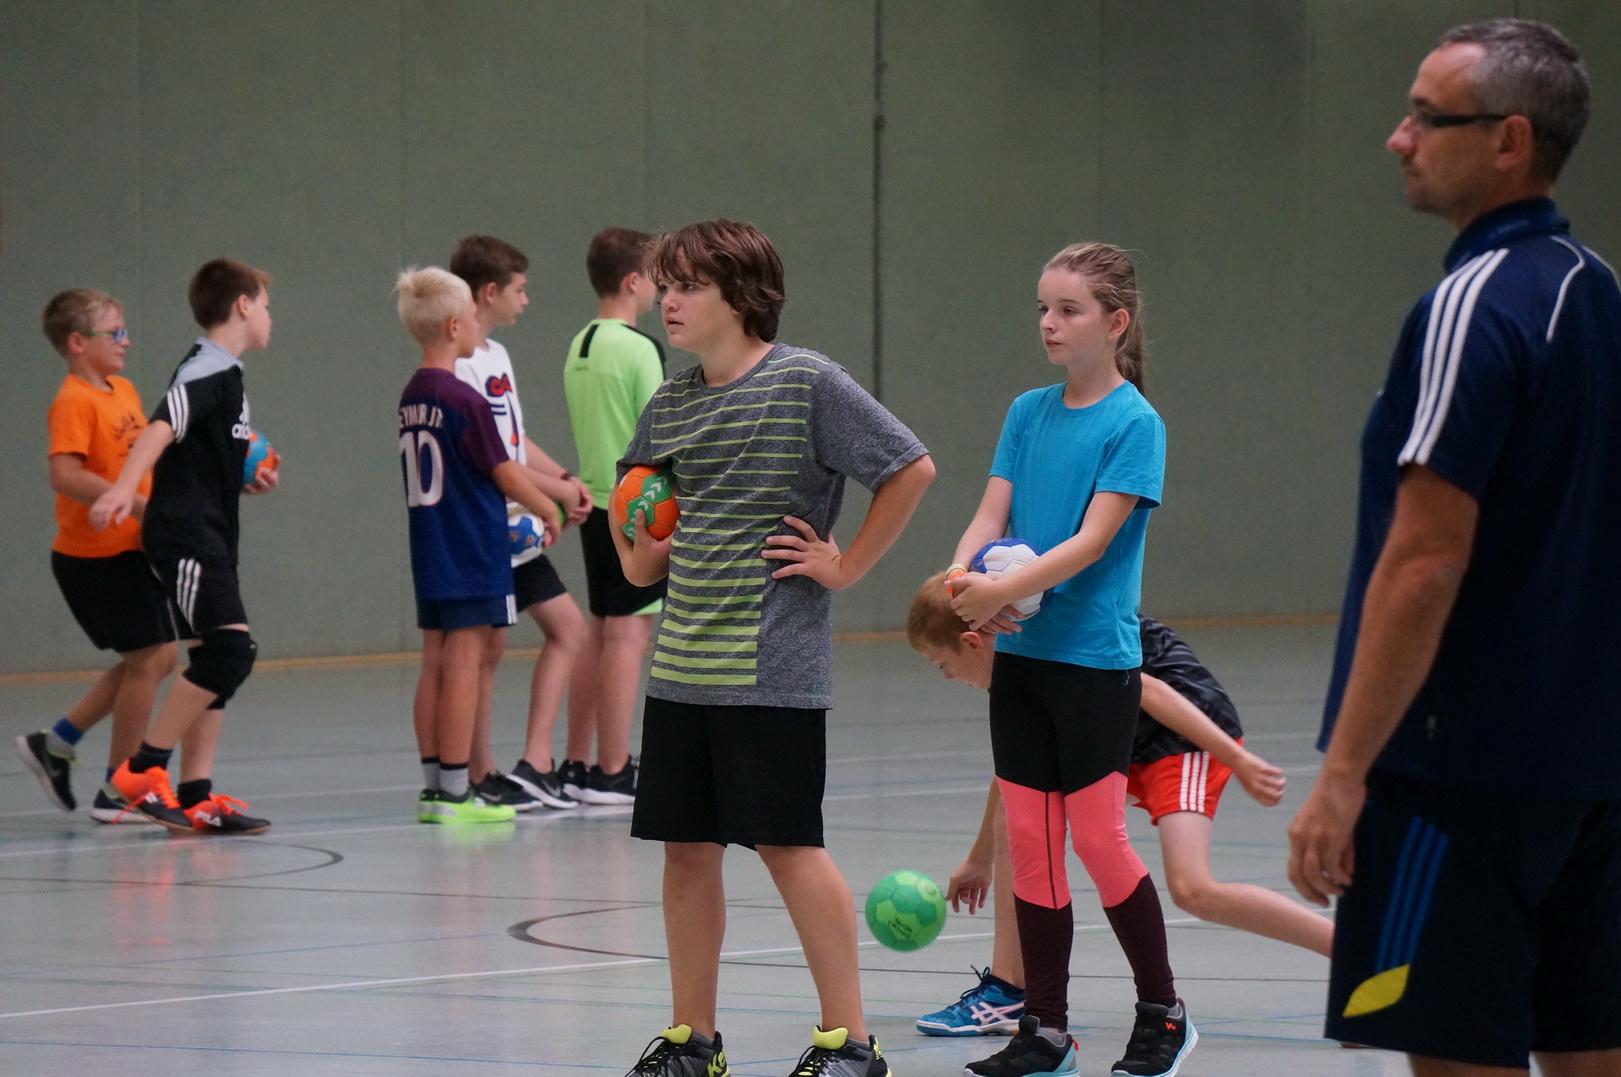 201808_Handballcamp_SDH_MG_081w